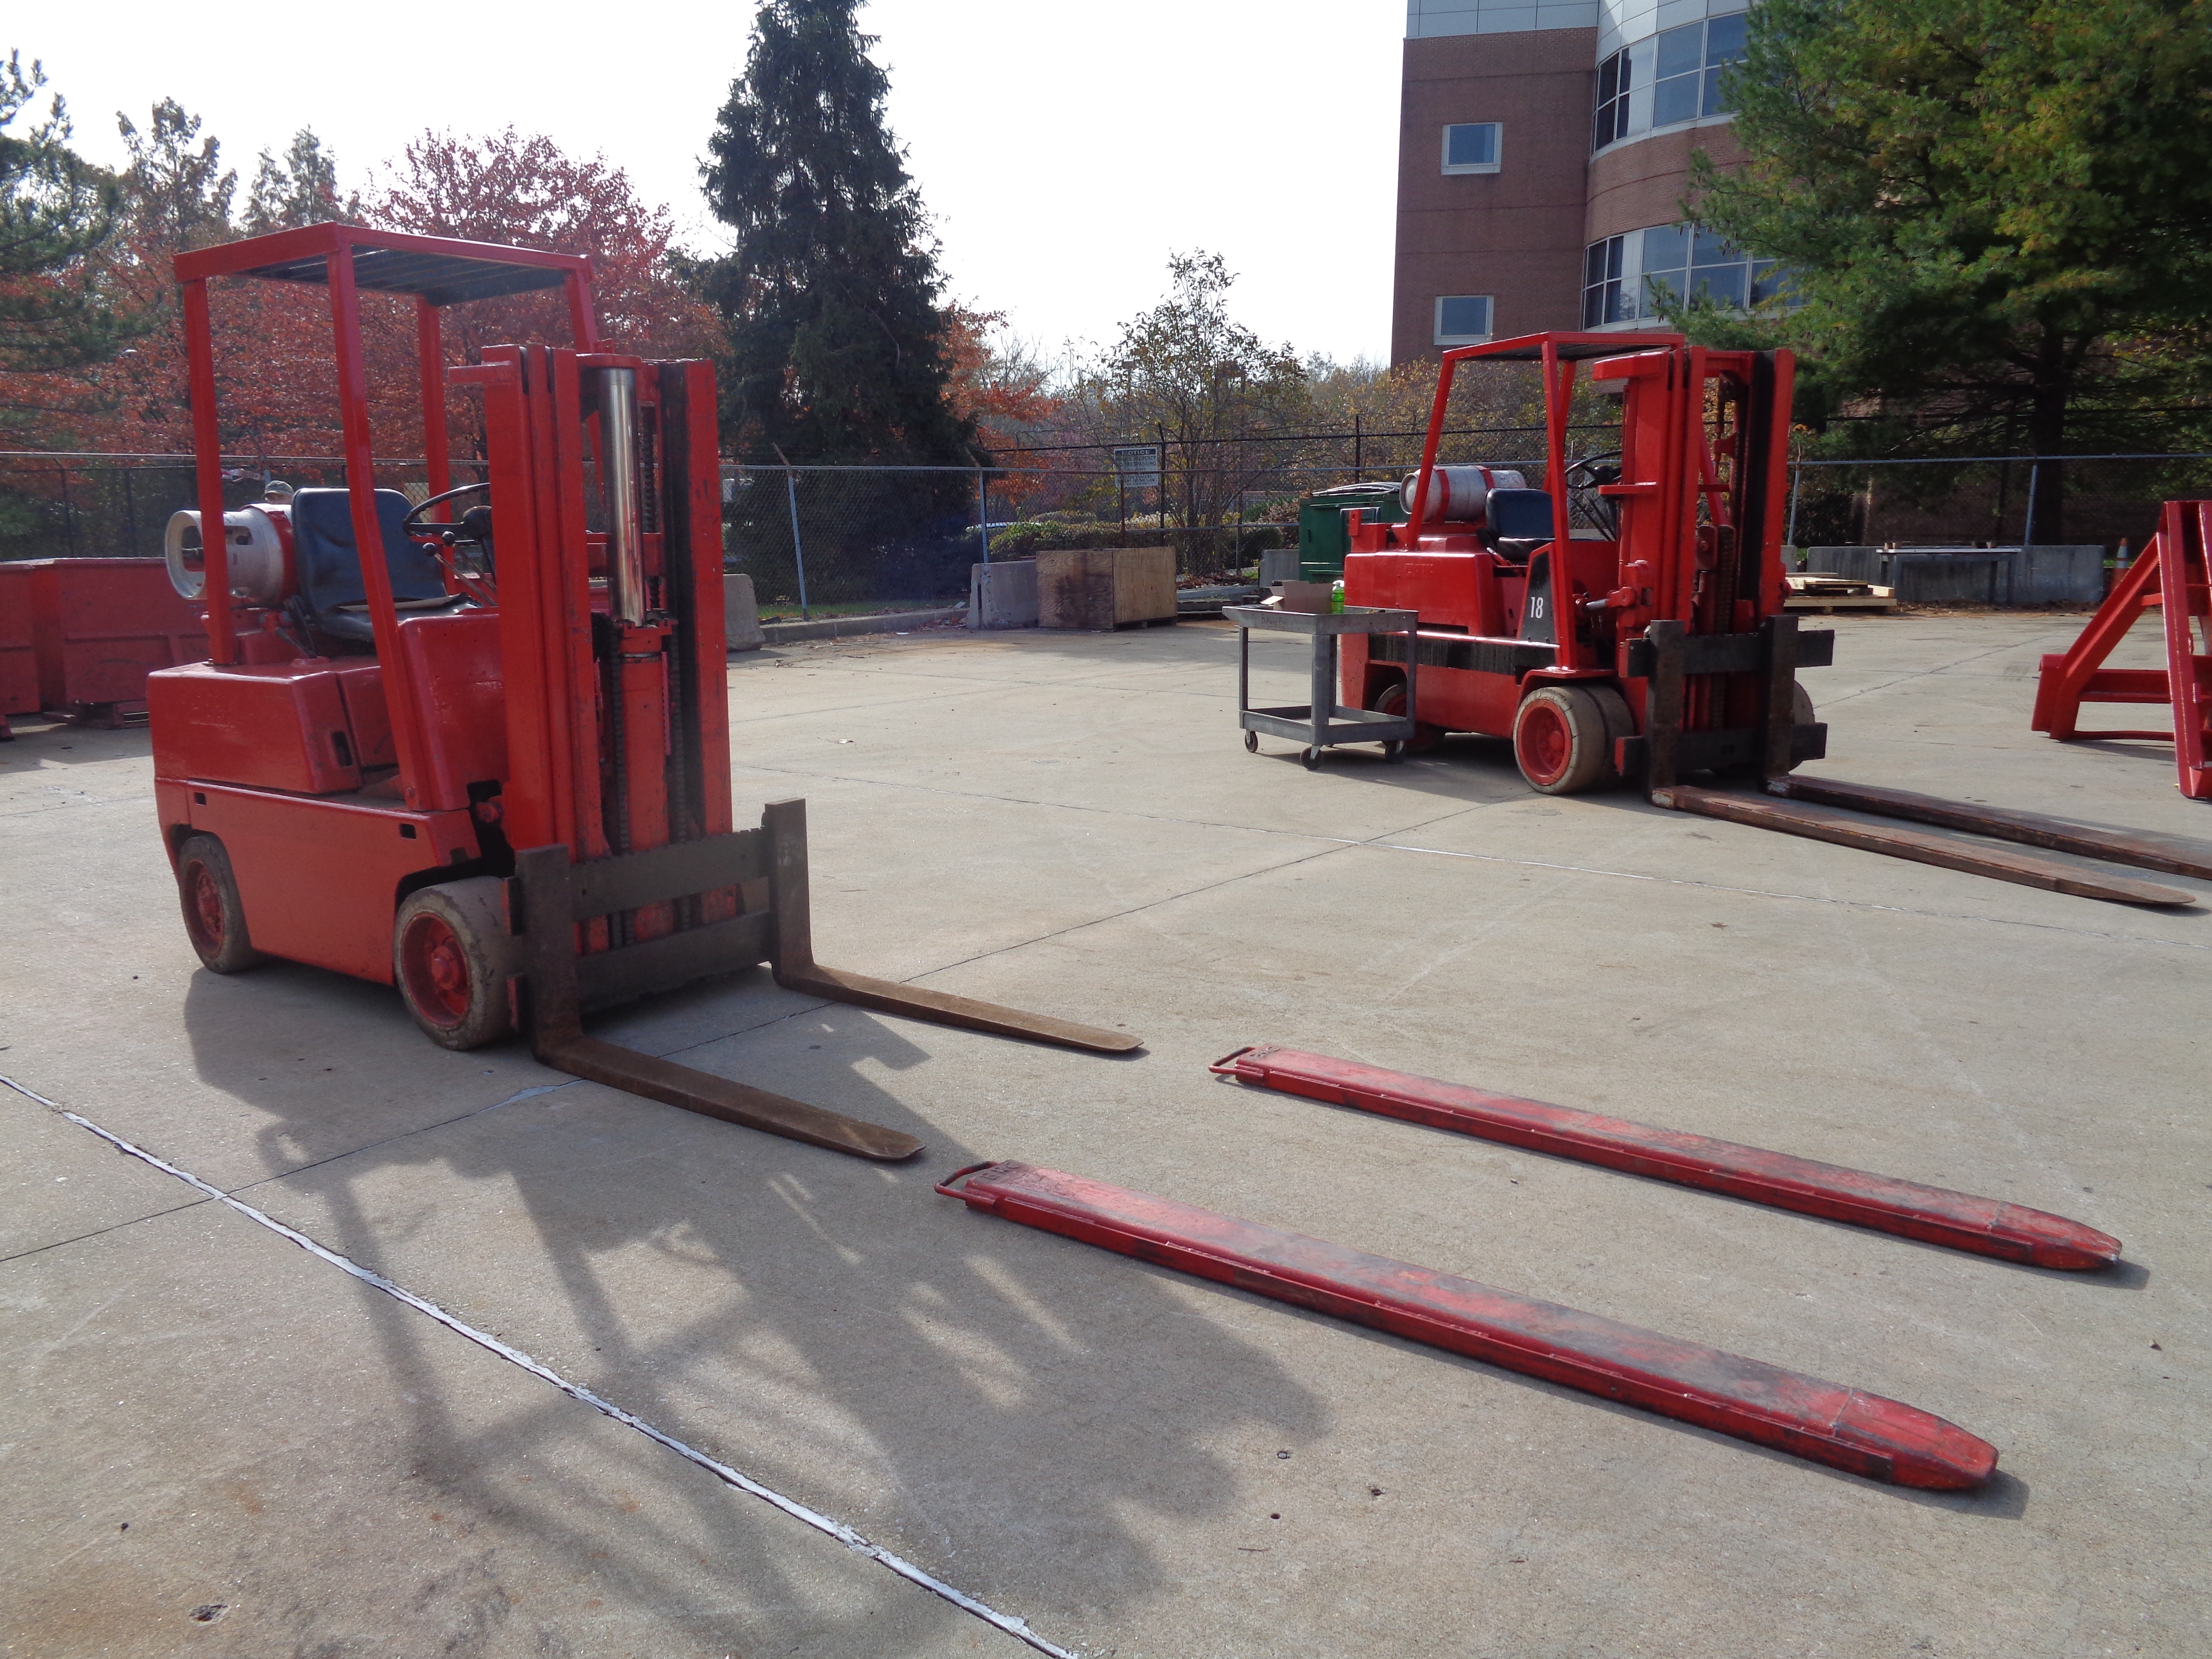 Clark C500-45 Forklift- 4,500 lbs - Image 10 of 10